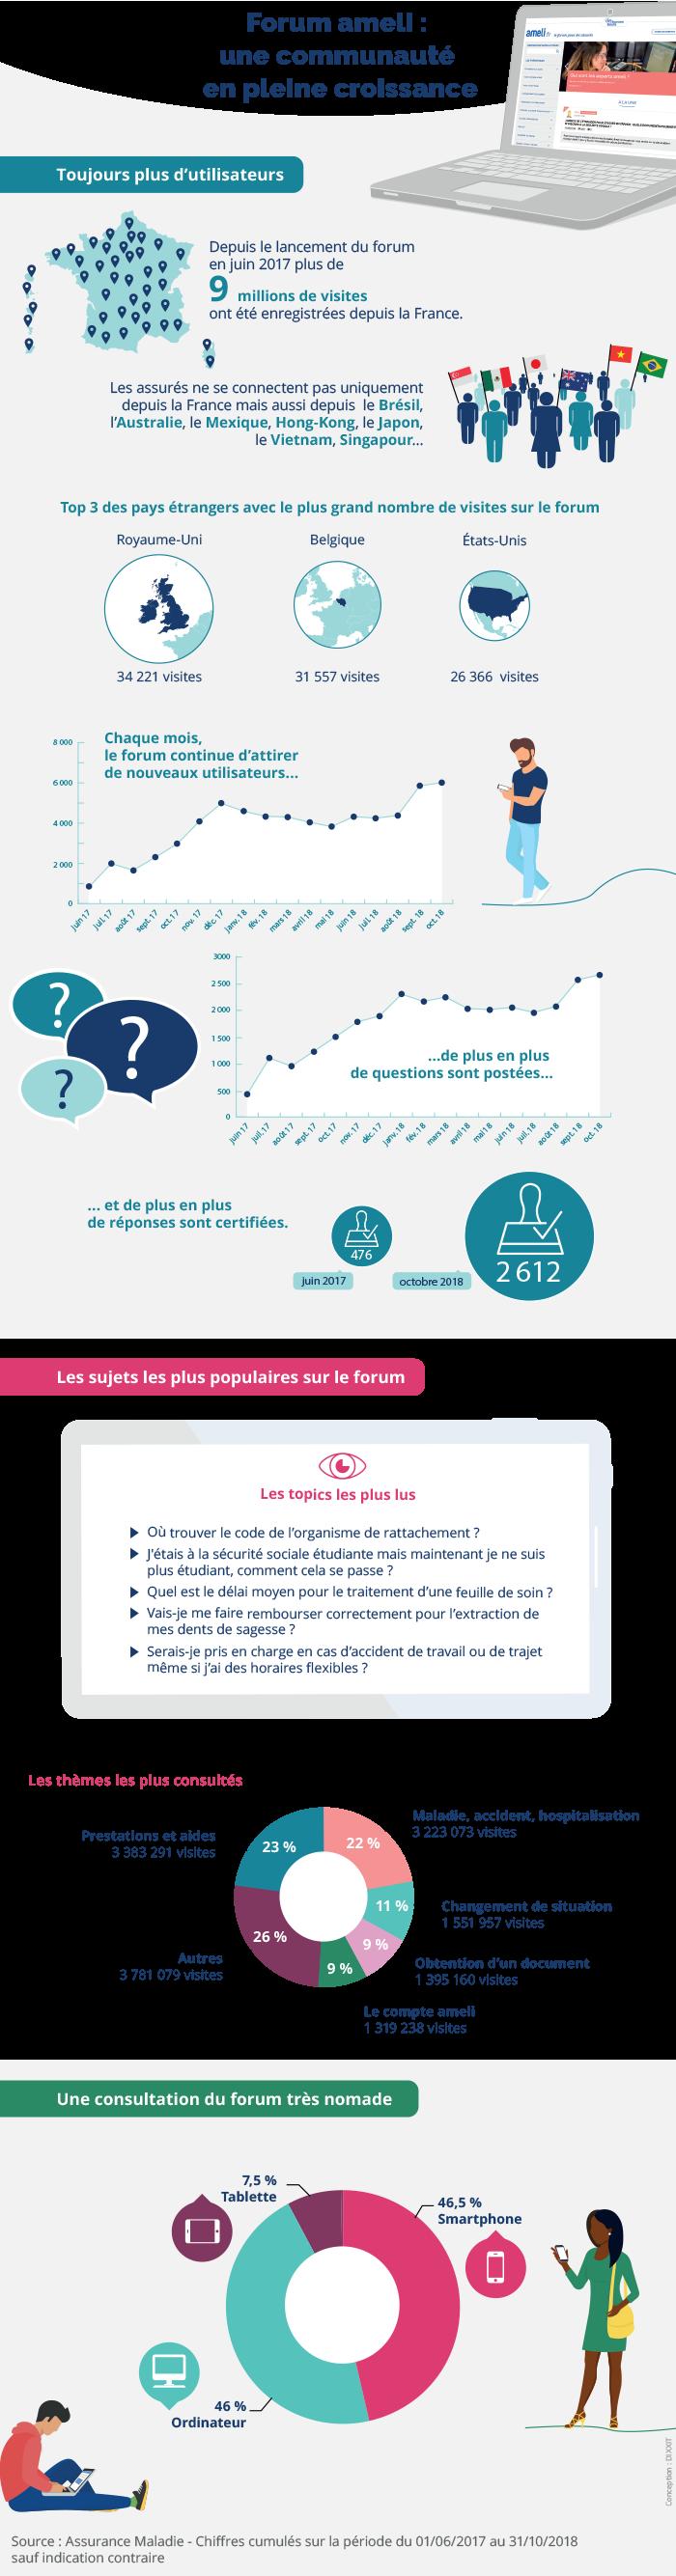 infographie-actu-forum-ameli.png